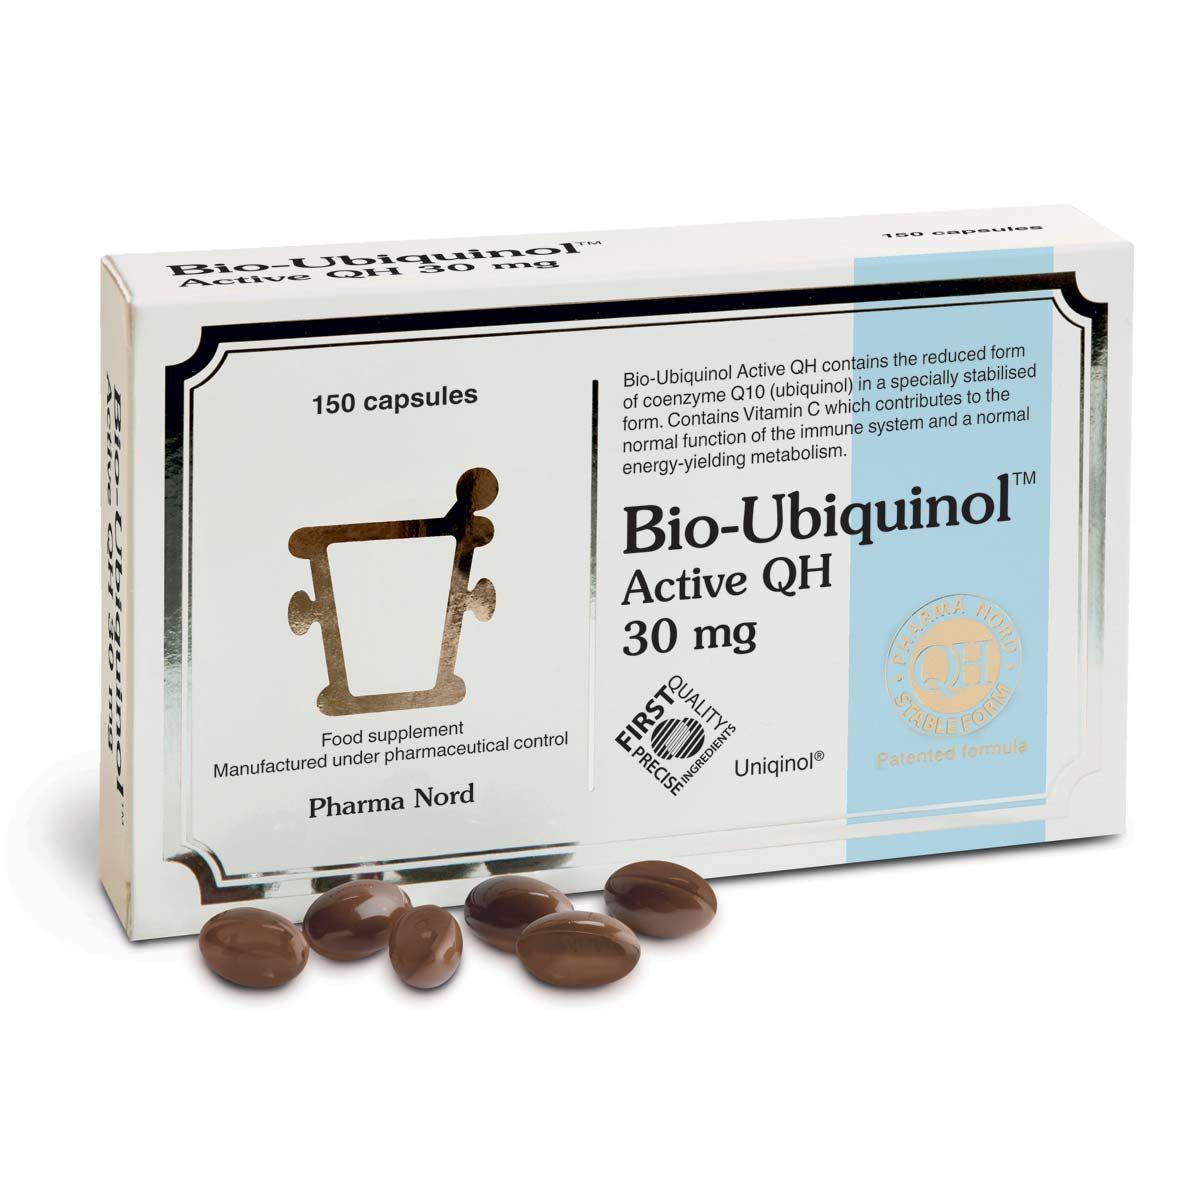 Bio-Ubiquinol Active QH 30mg 150's